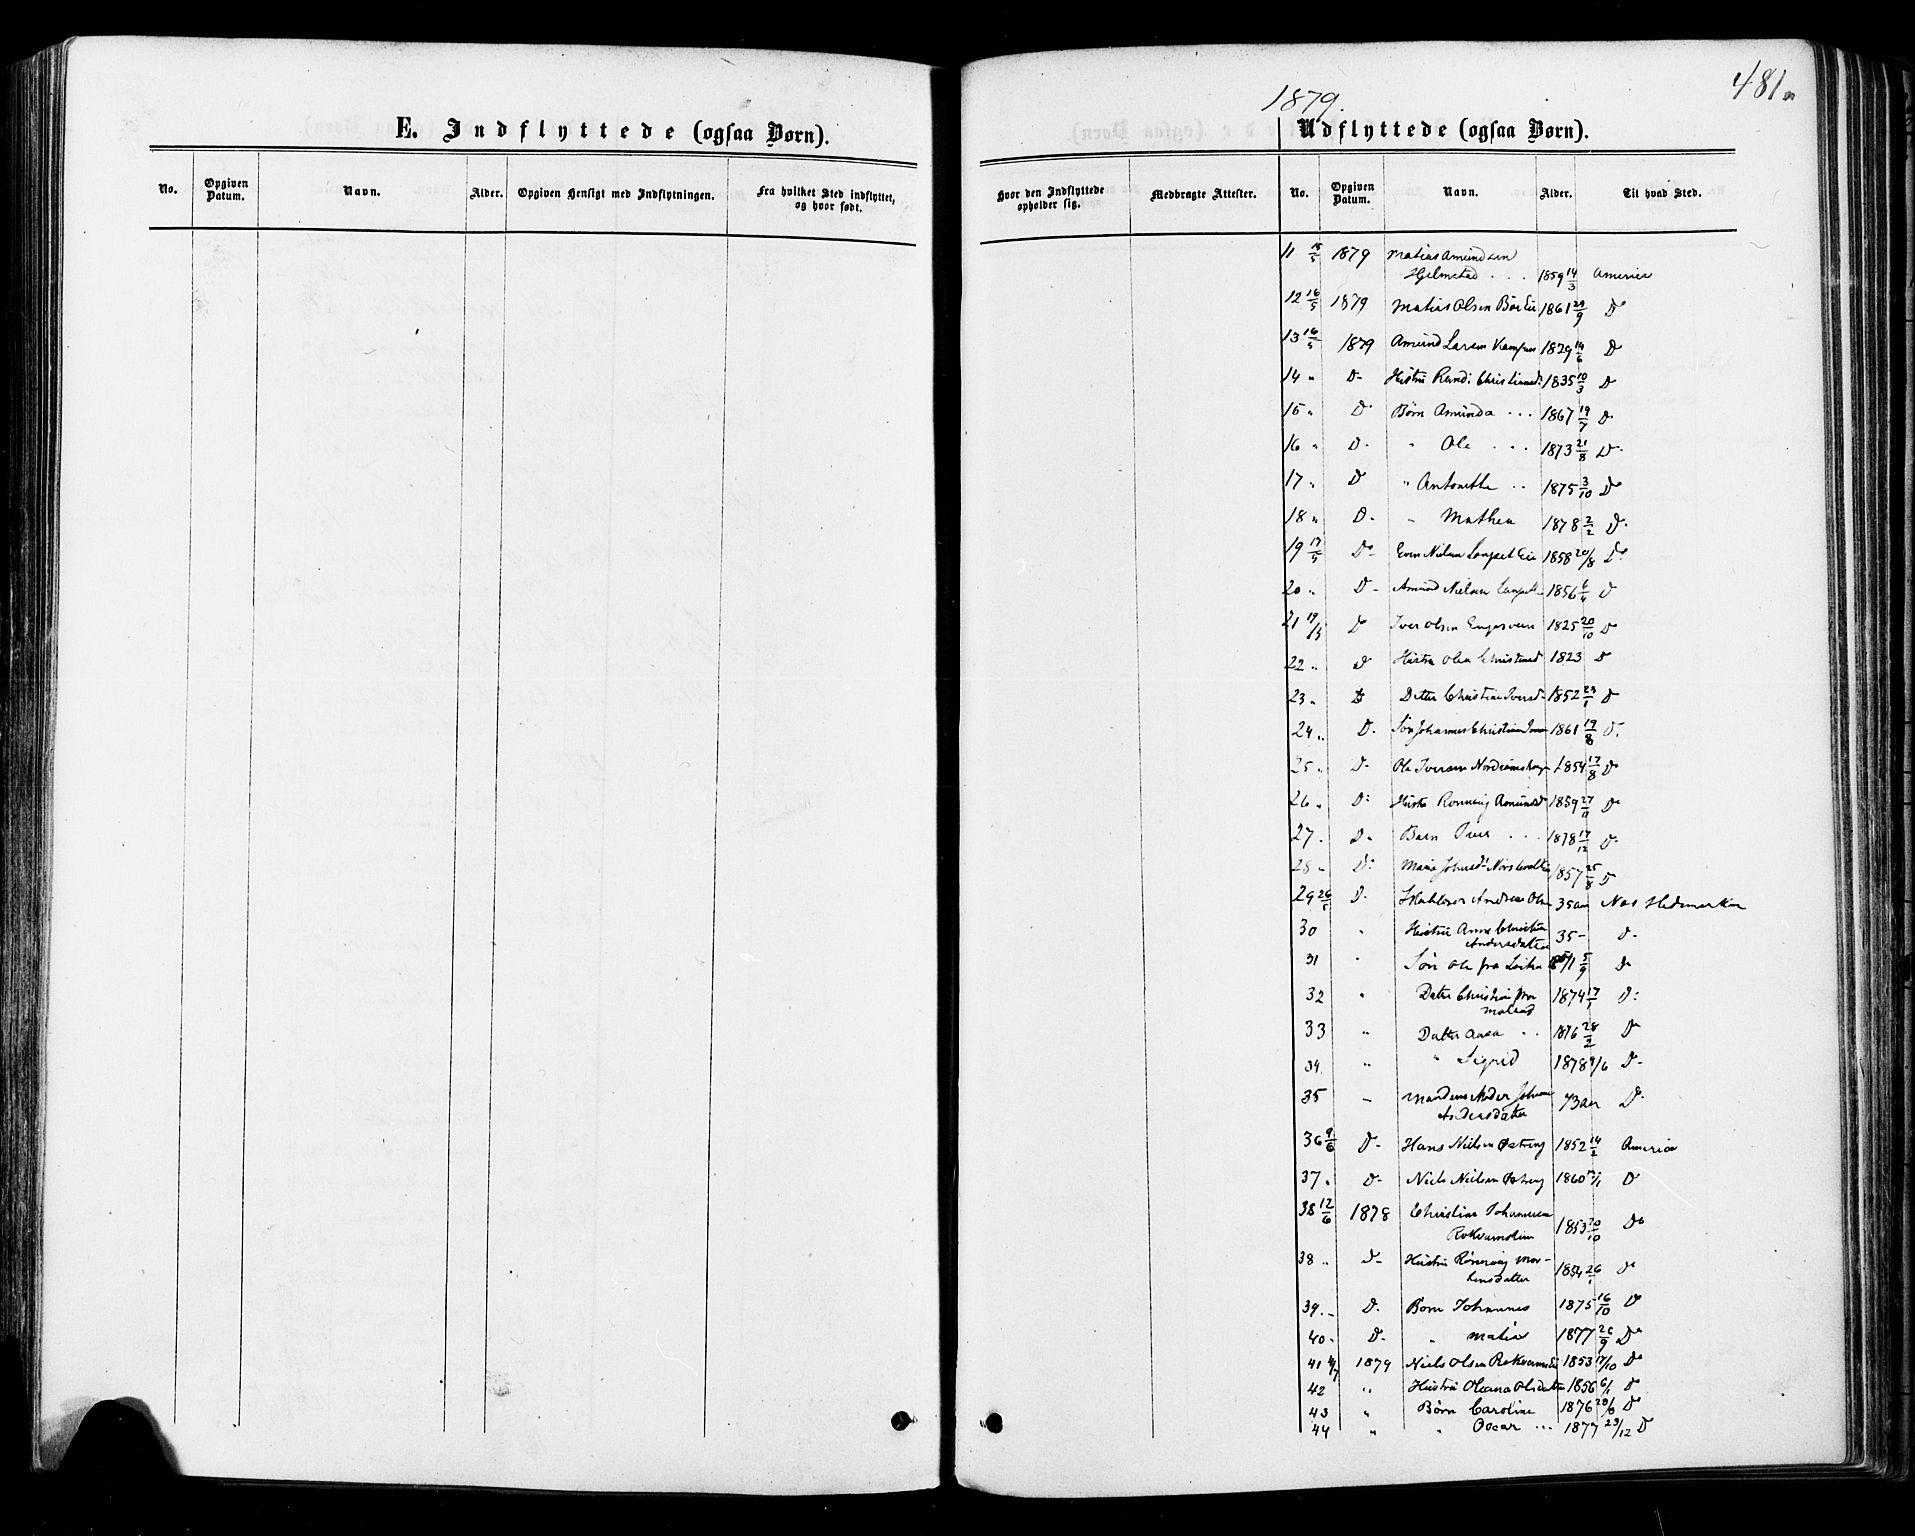 SAH, Østre Gausdal prestekontor, Ministerialbok nr. 1, 1874-1886, s. 481